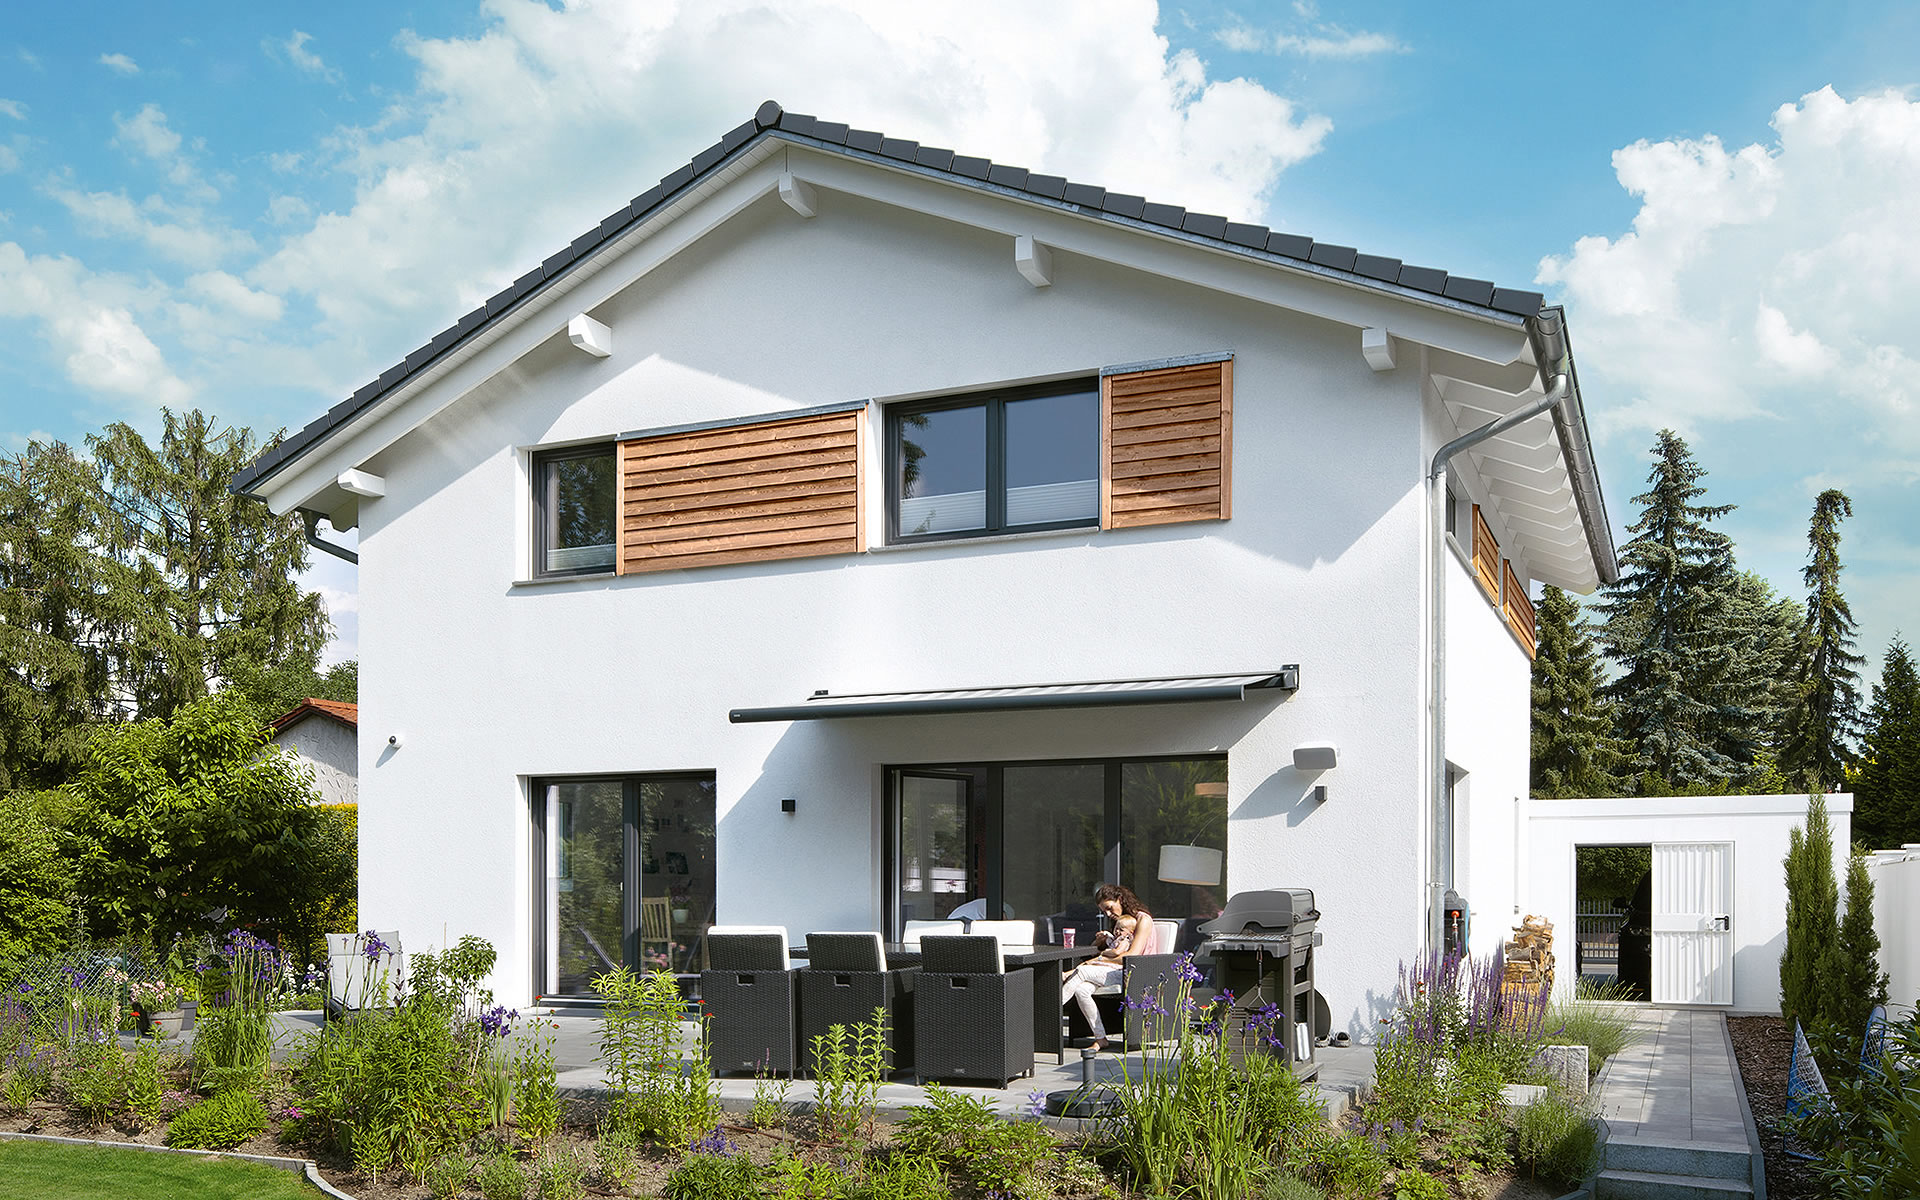 Individual (Greve) von WeberHaus GmbH & Co. KG